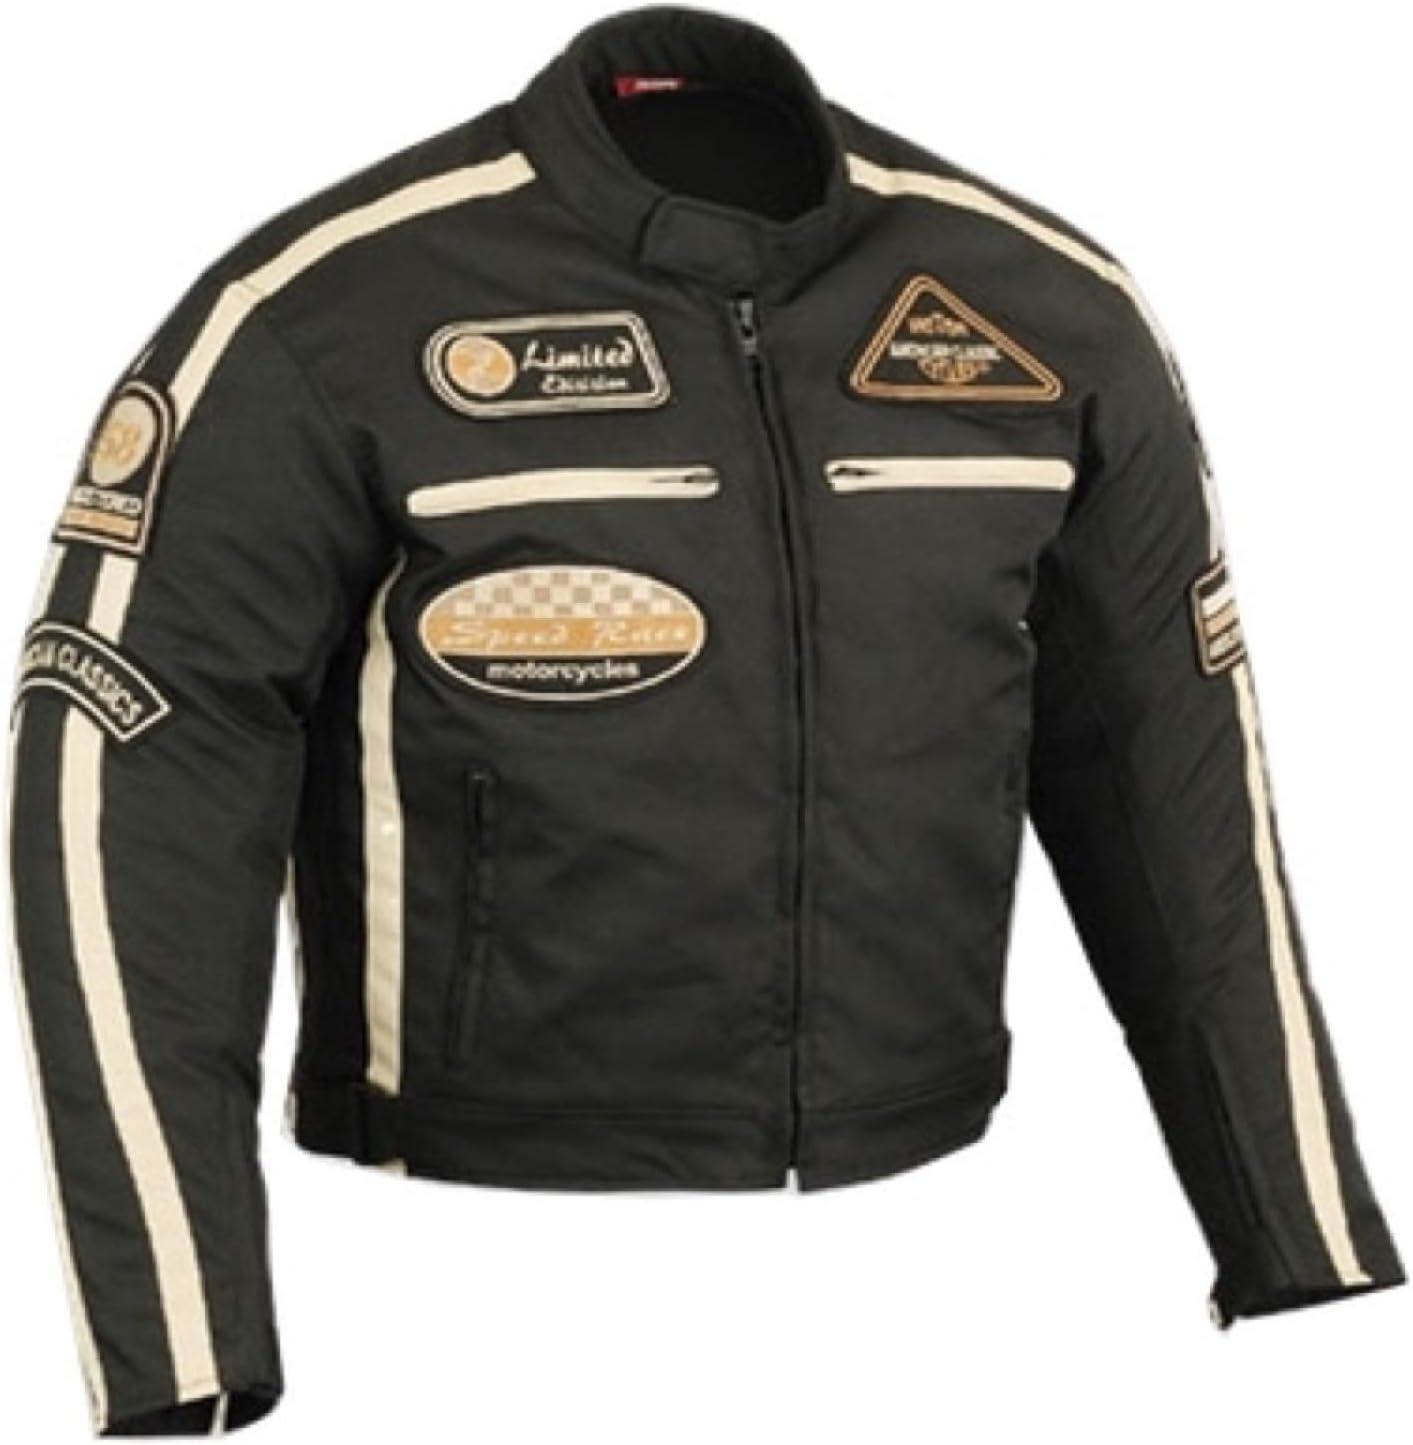 Herren Motorradjacke Motorrad Jacke Cordura Textil Roller Quad Biker Touring Touren Schwarz Für Herren S Bekleidung